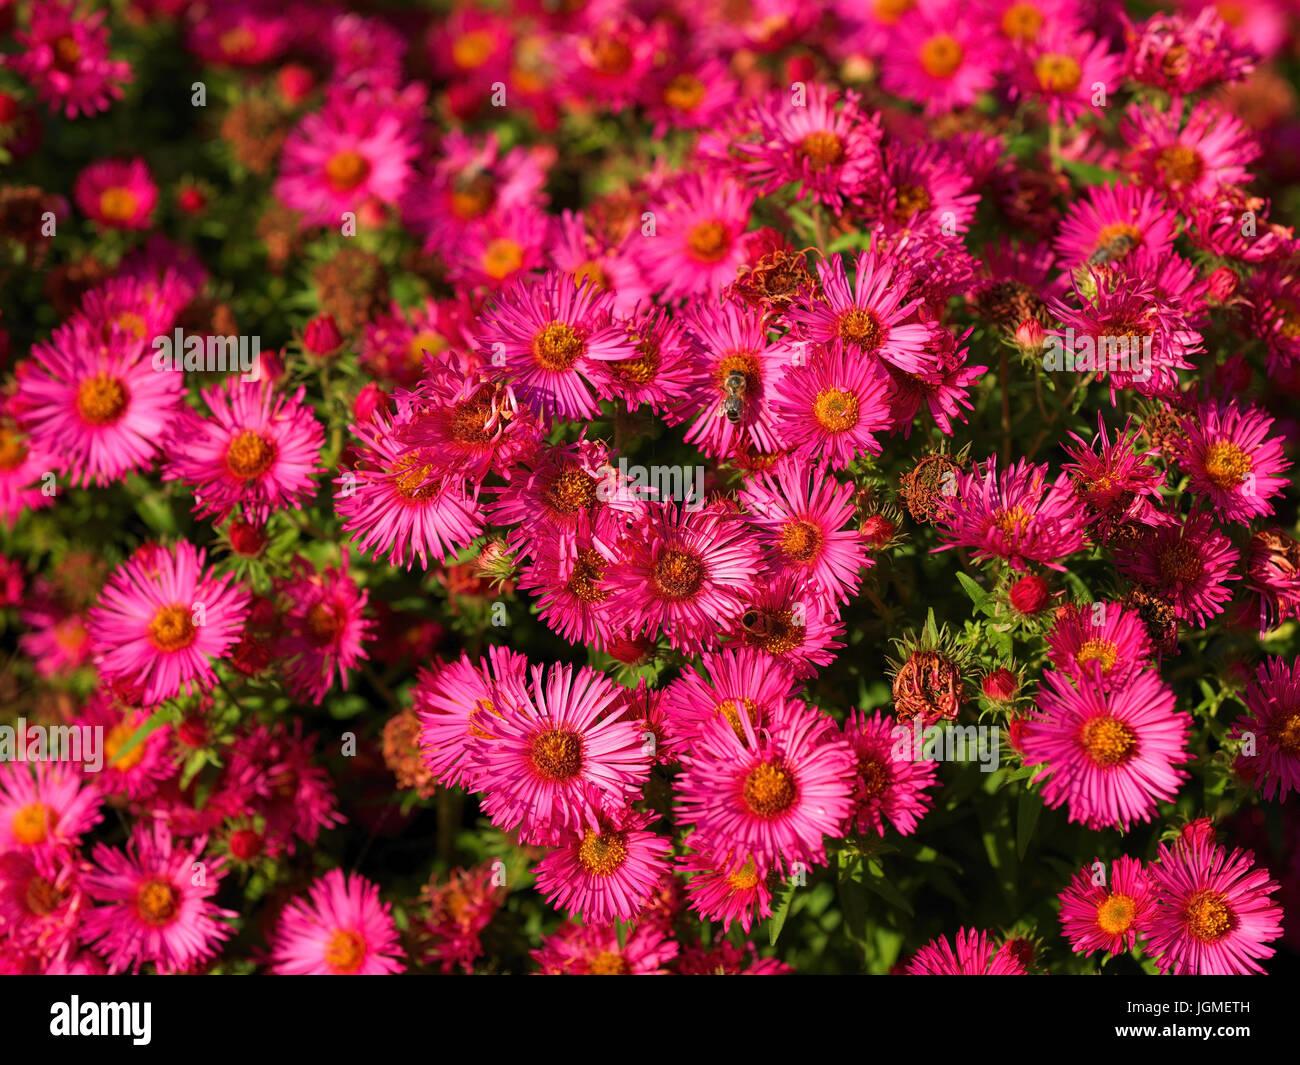 Rose Herbstaster Pink Aster Rosa Herbstaster Pink Aster Stock